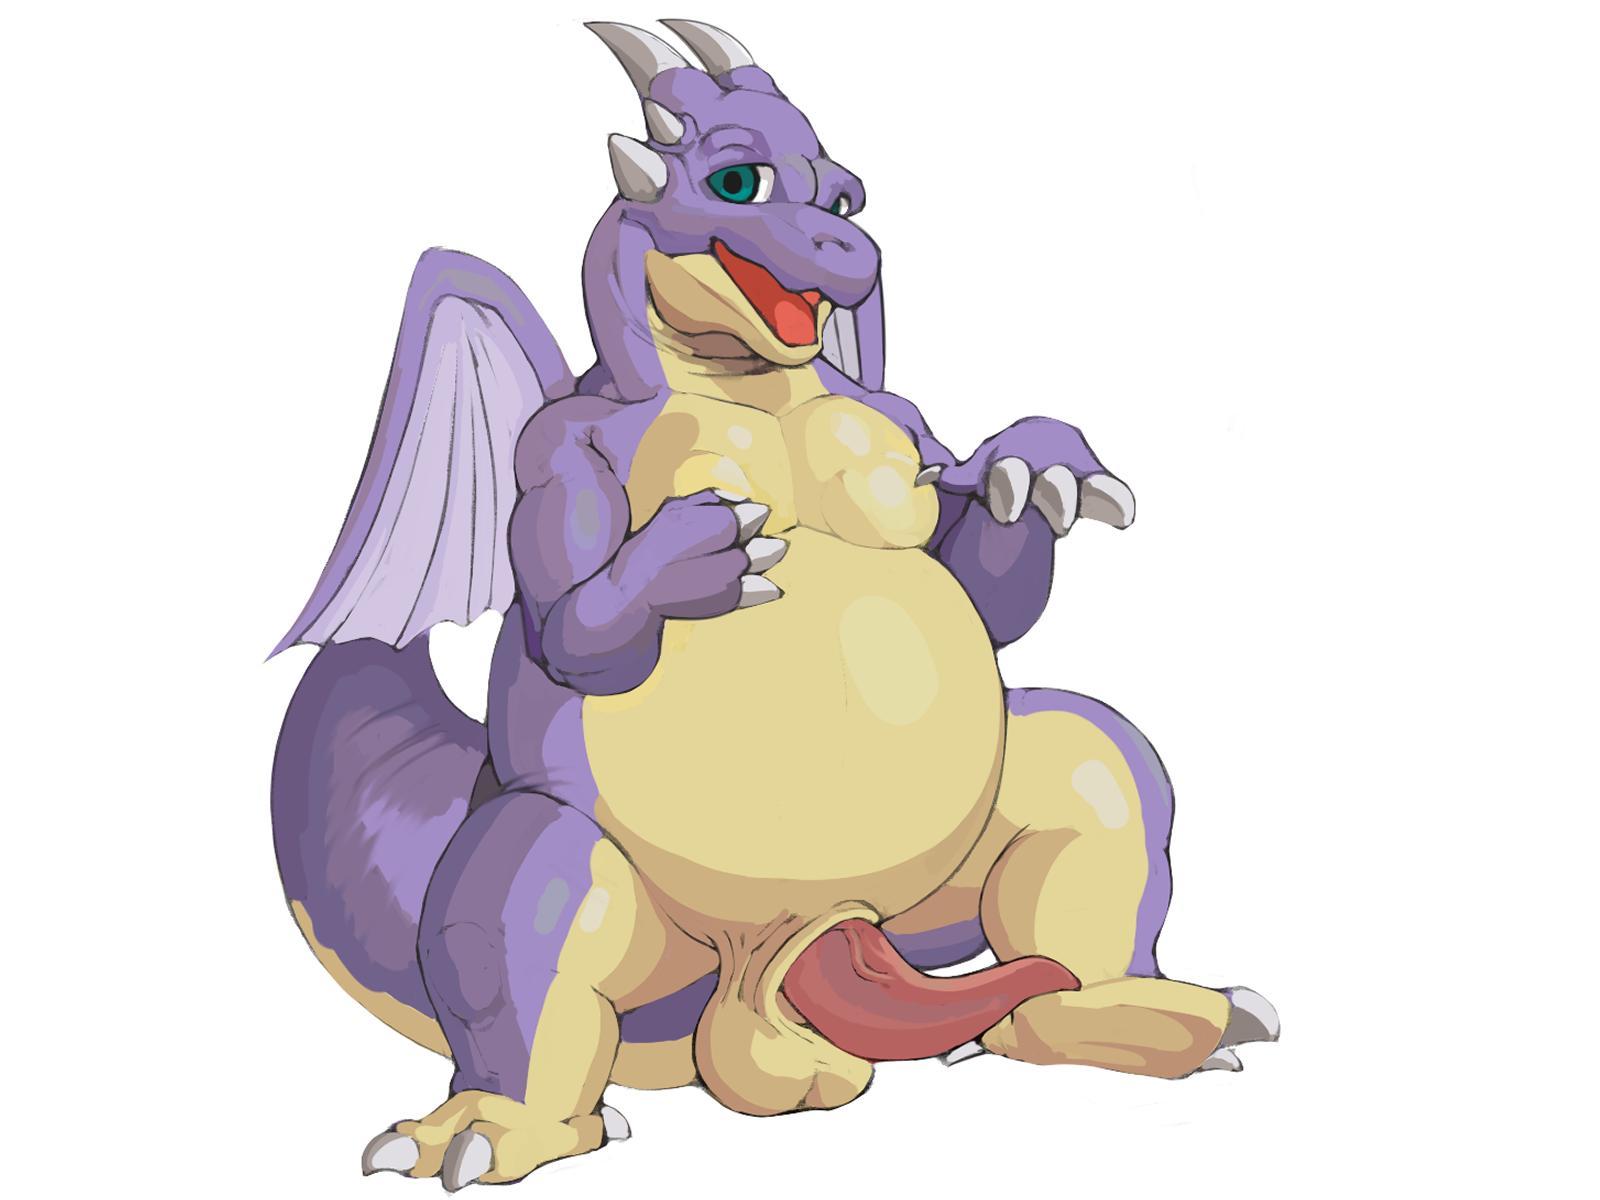 dragon z sex gay ball Avatar the last airbender futa